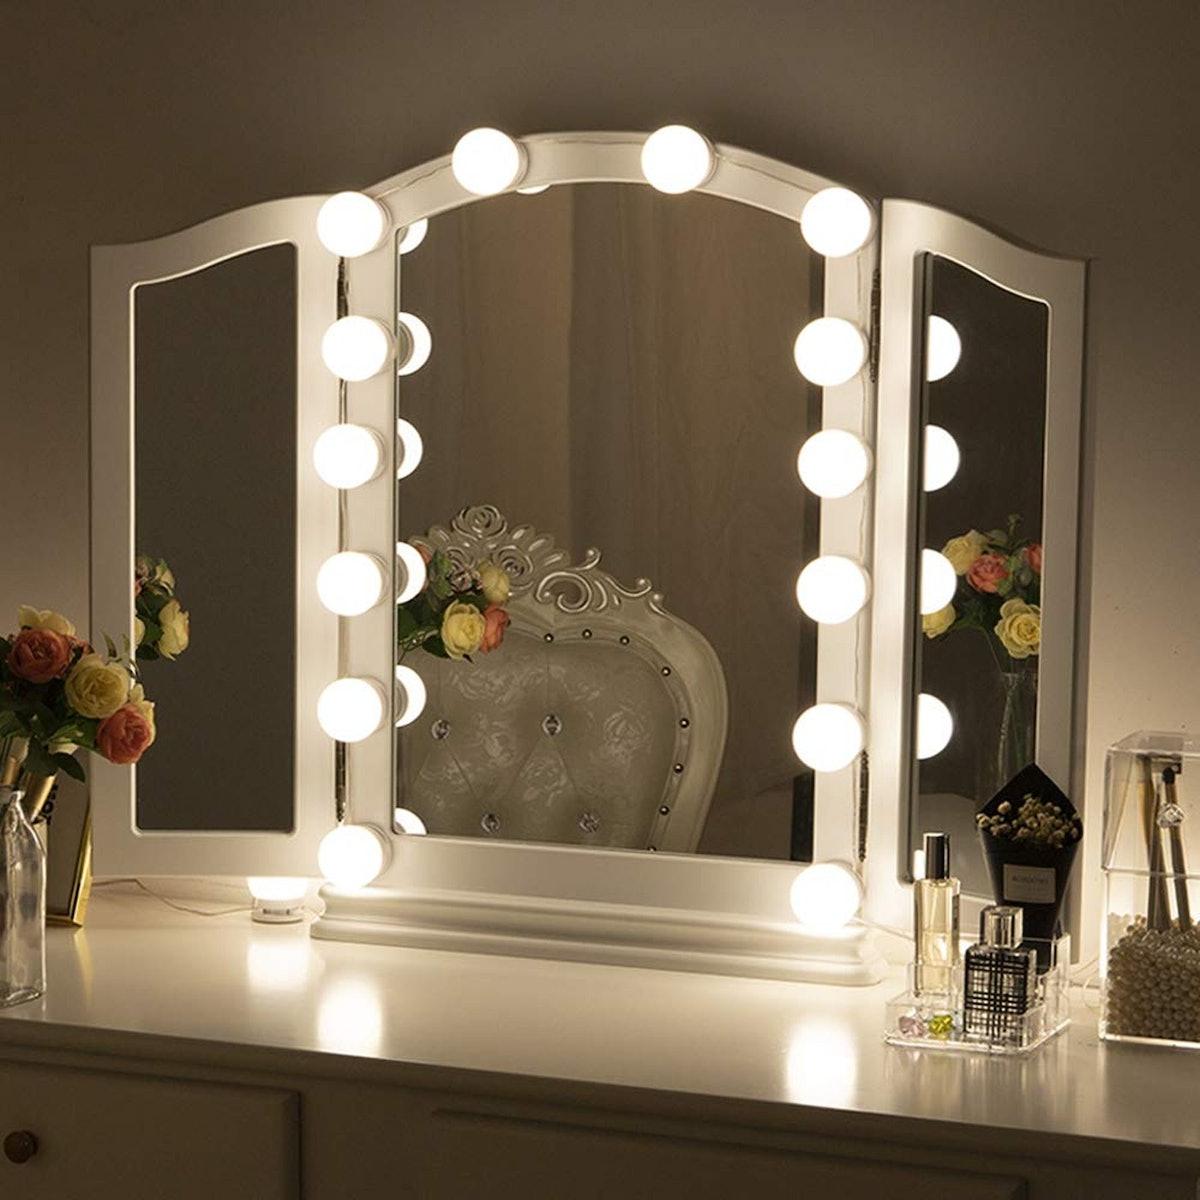 Chende Vanity Mirror Light Kit